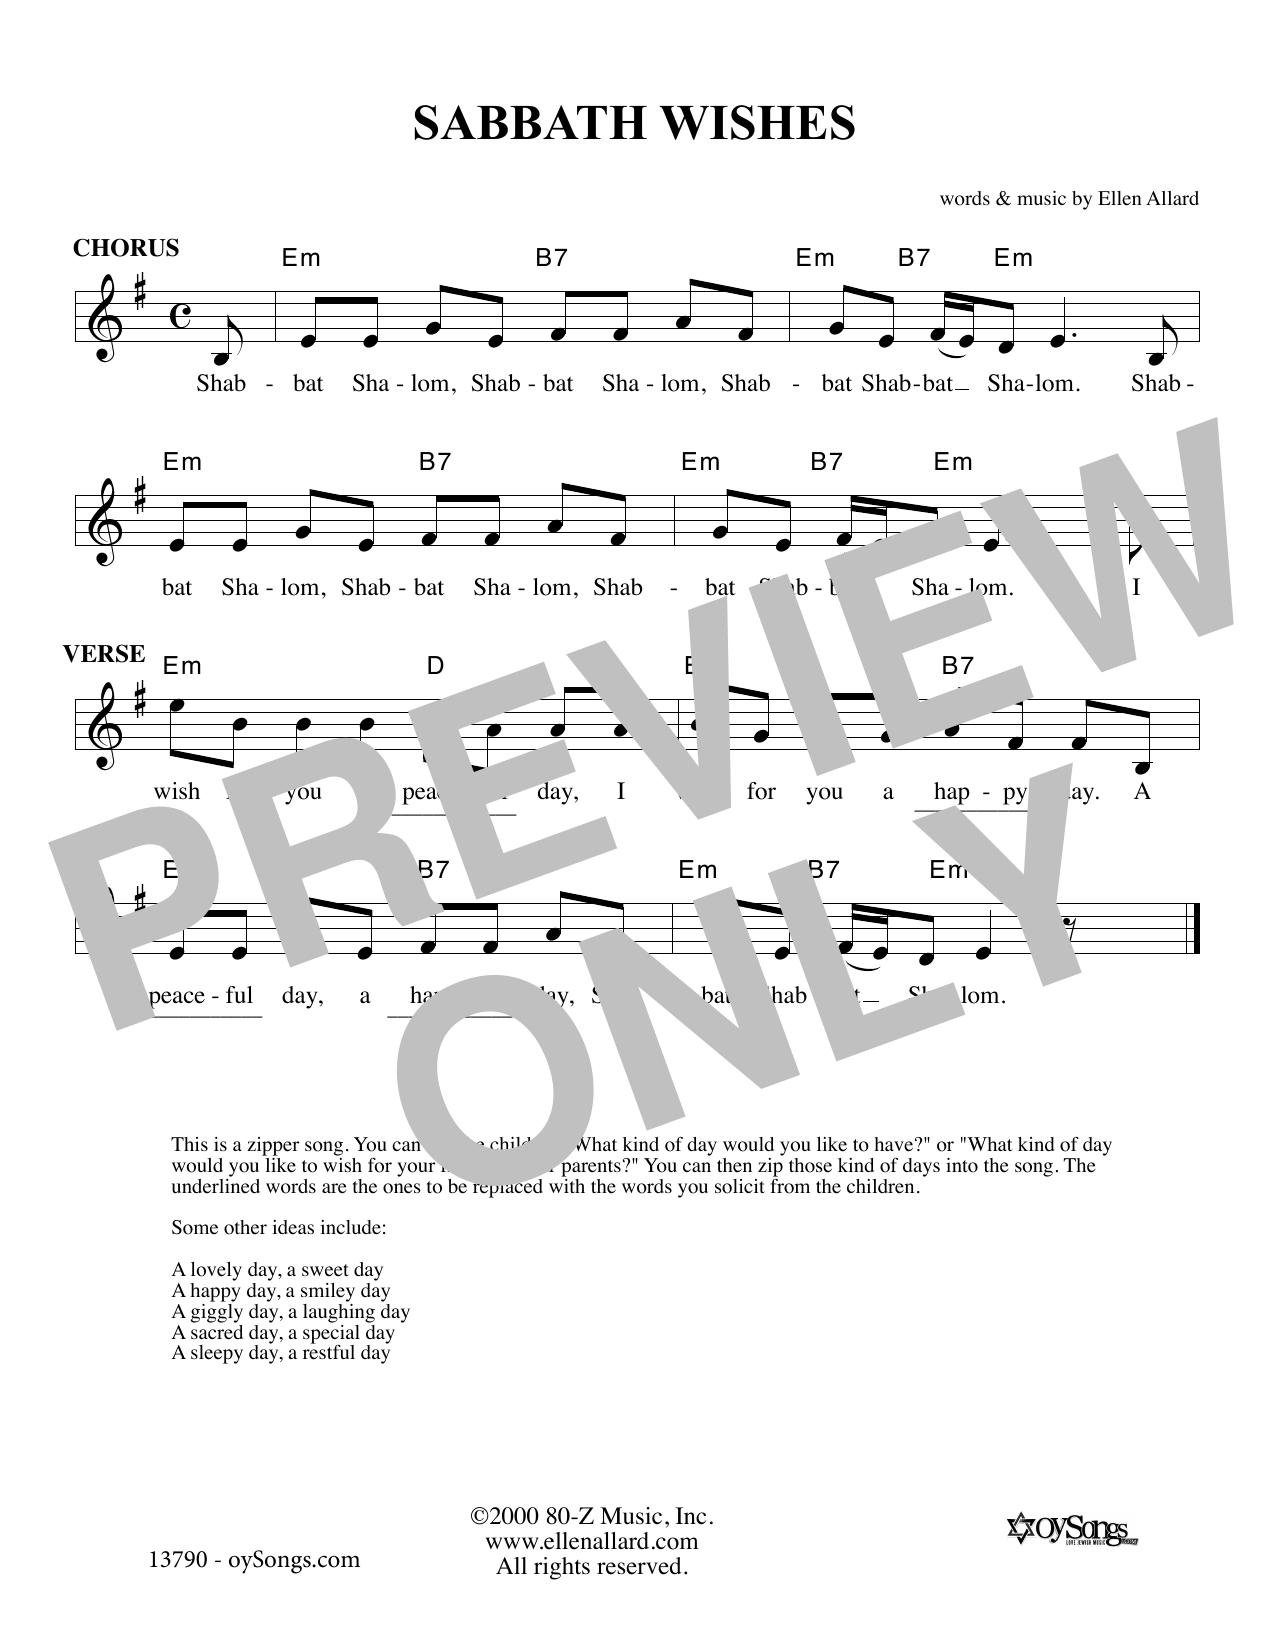 Ellen Allard Sabbath Wishes sheet music notes and chords. Download Printable PDF.